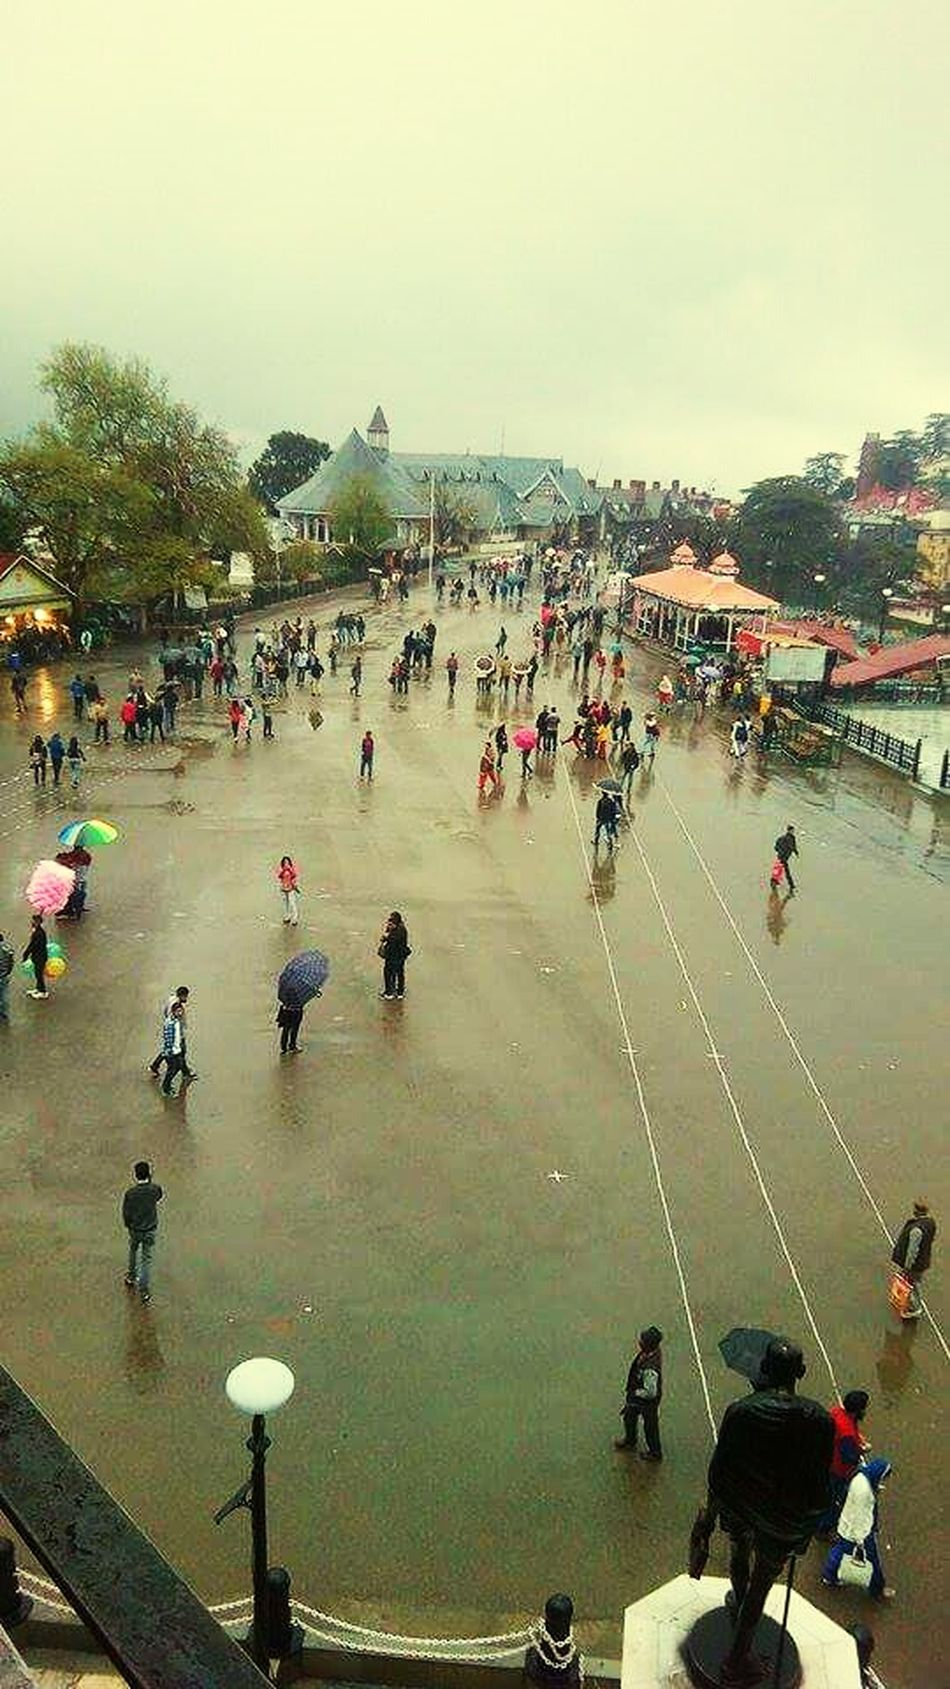 After The Rain After Rain After Rain View After Rain Weather After Rain :) After Rainy Day After Rainy After Rain... Afterrain